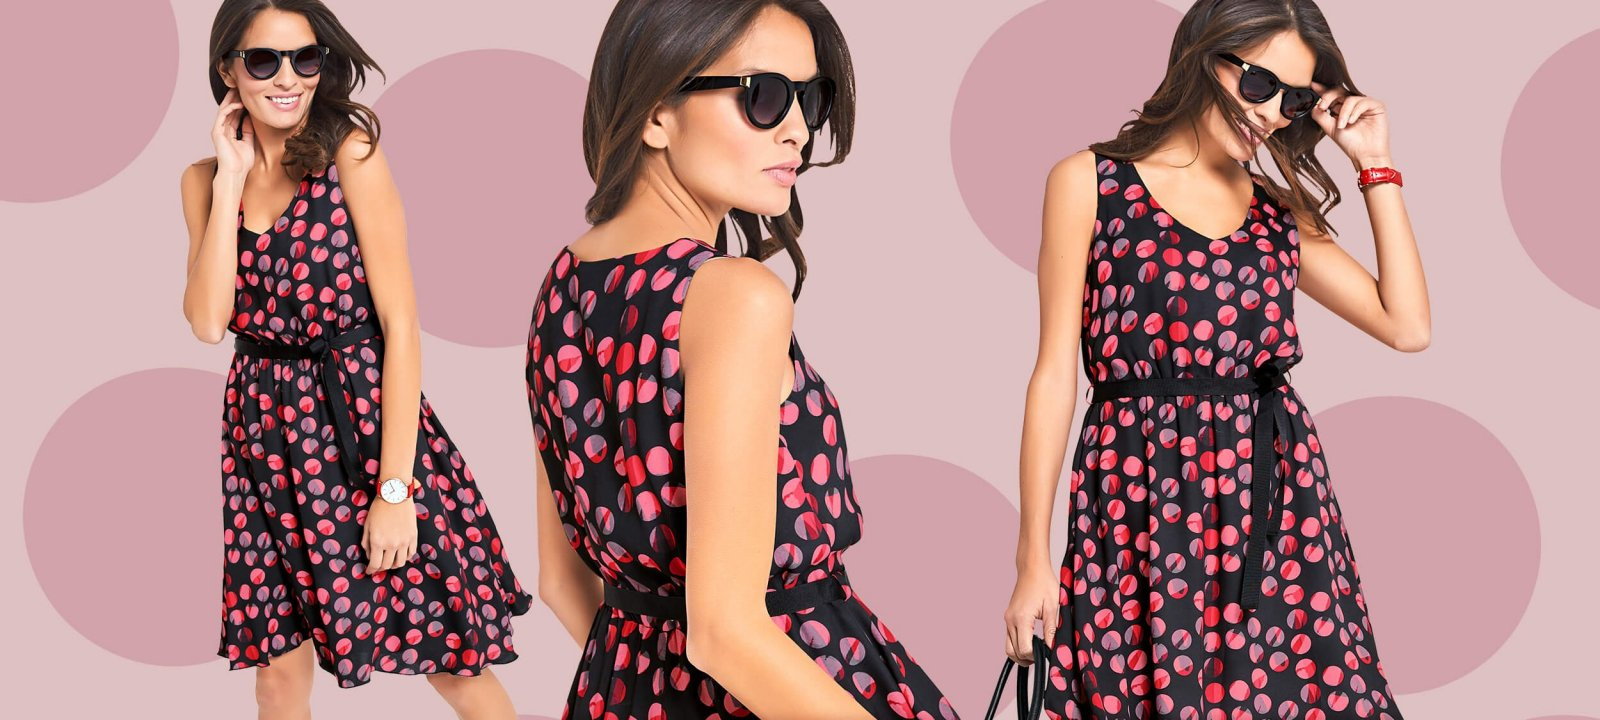 Frühlingskleid mit bunten Polka Dots